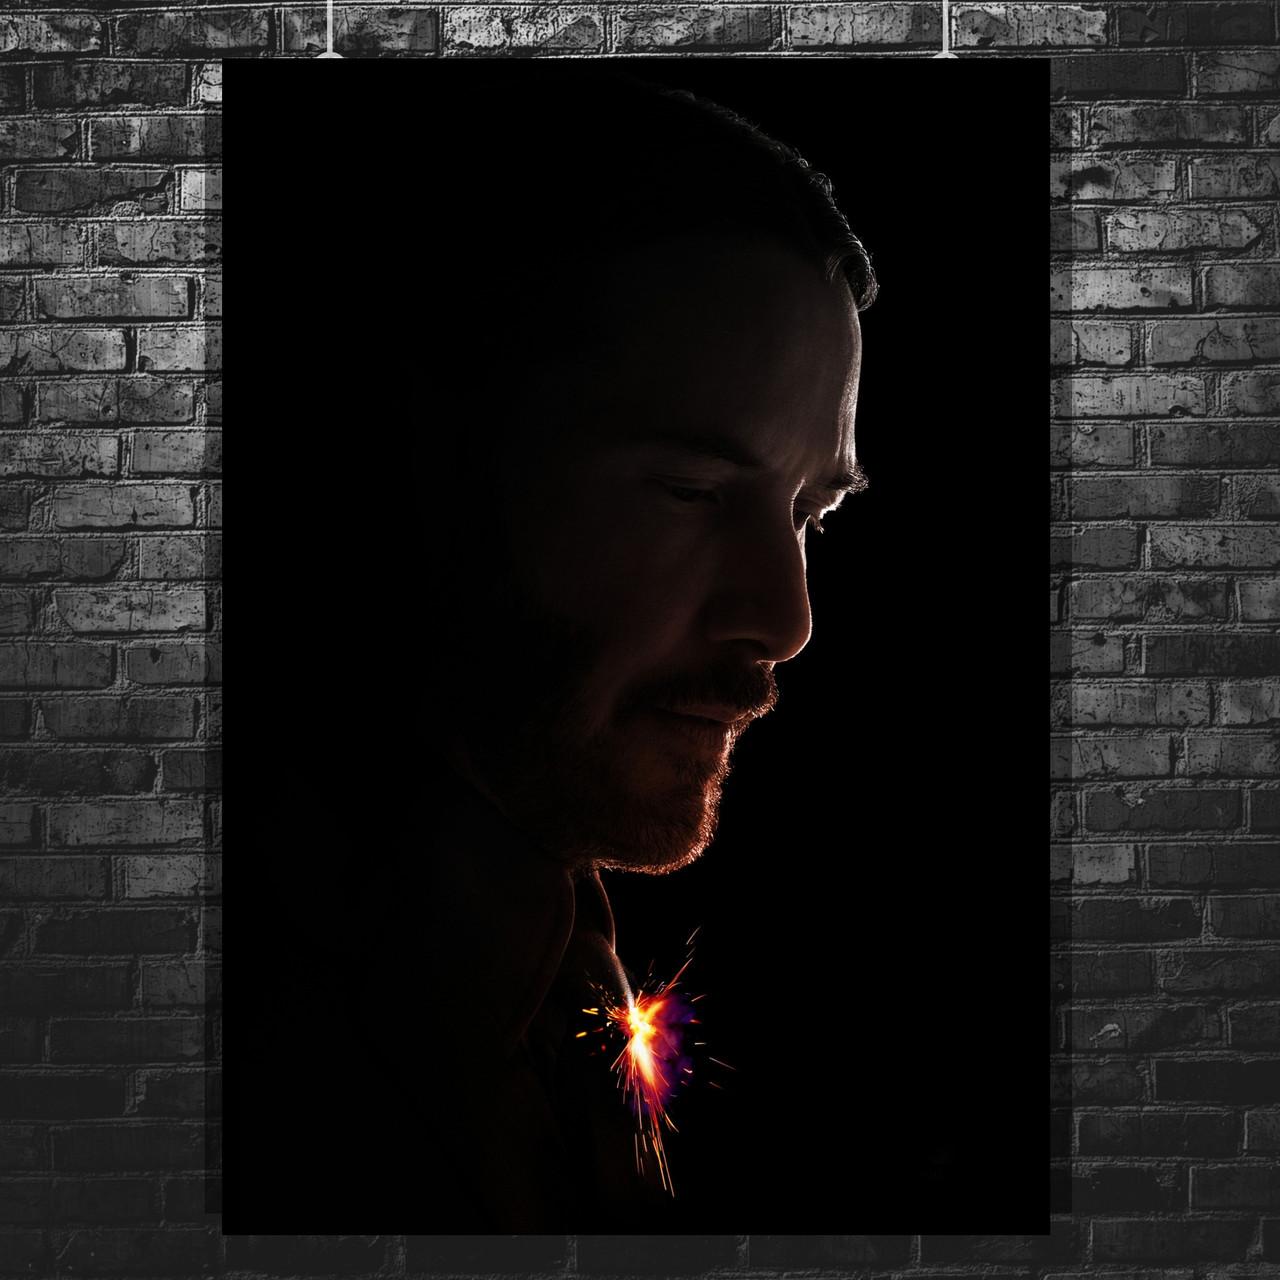 Постер John Wick 2, Джон Уик 2, Киану Ривз. Размер 60x43см (A2). Глянцевая бумага